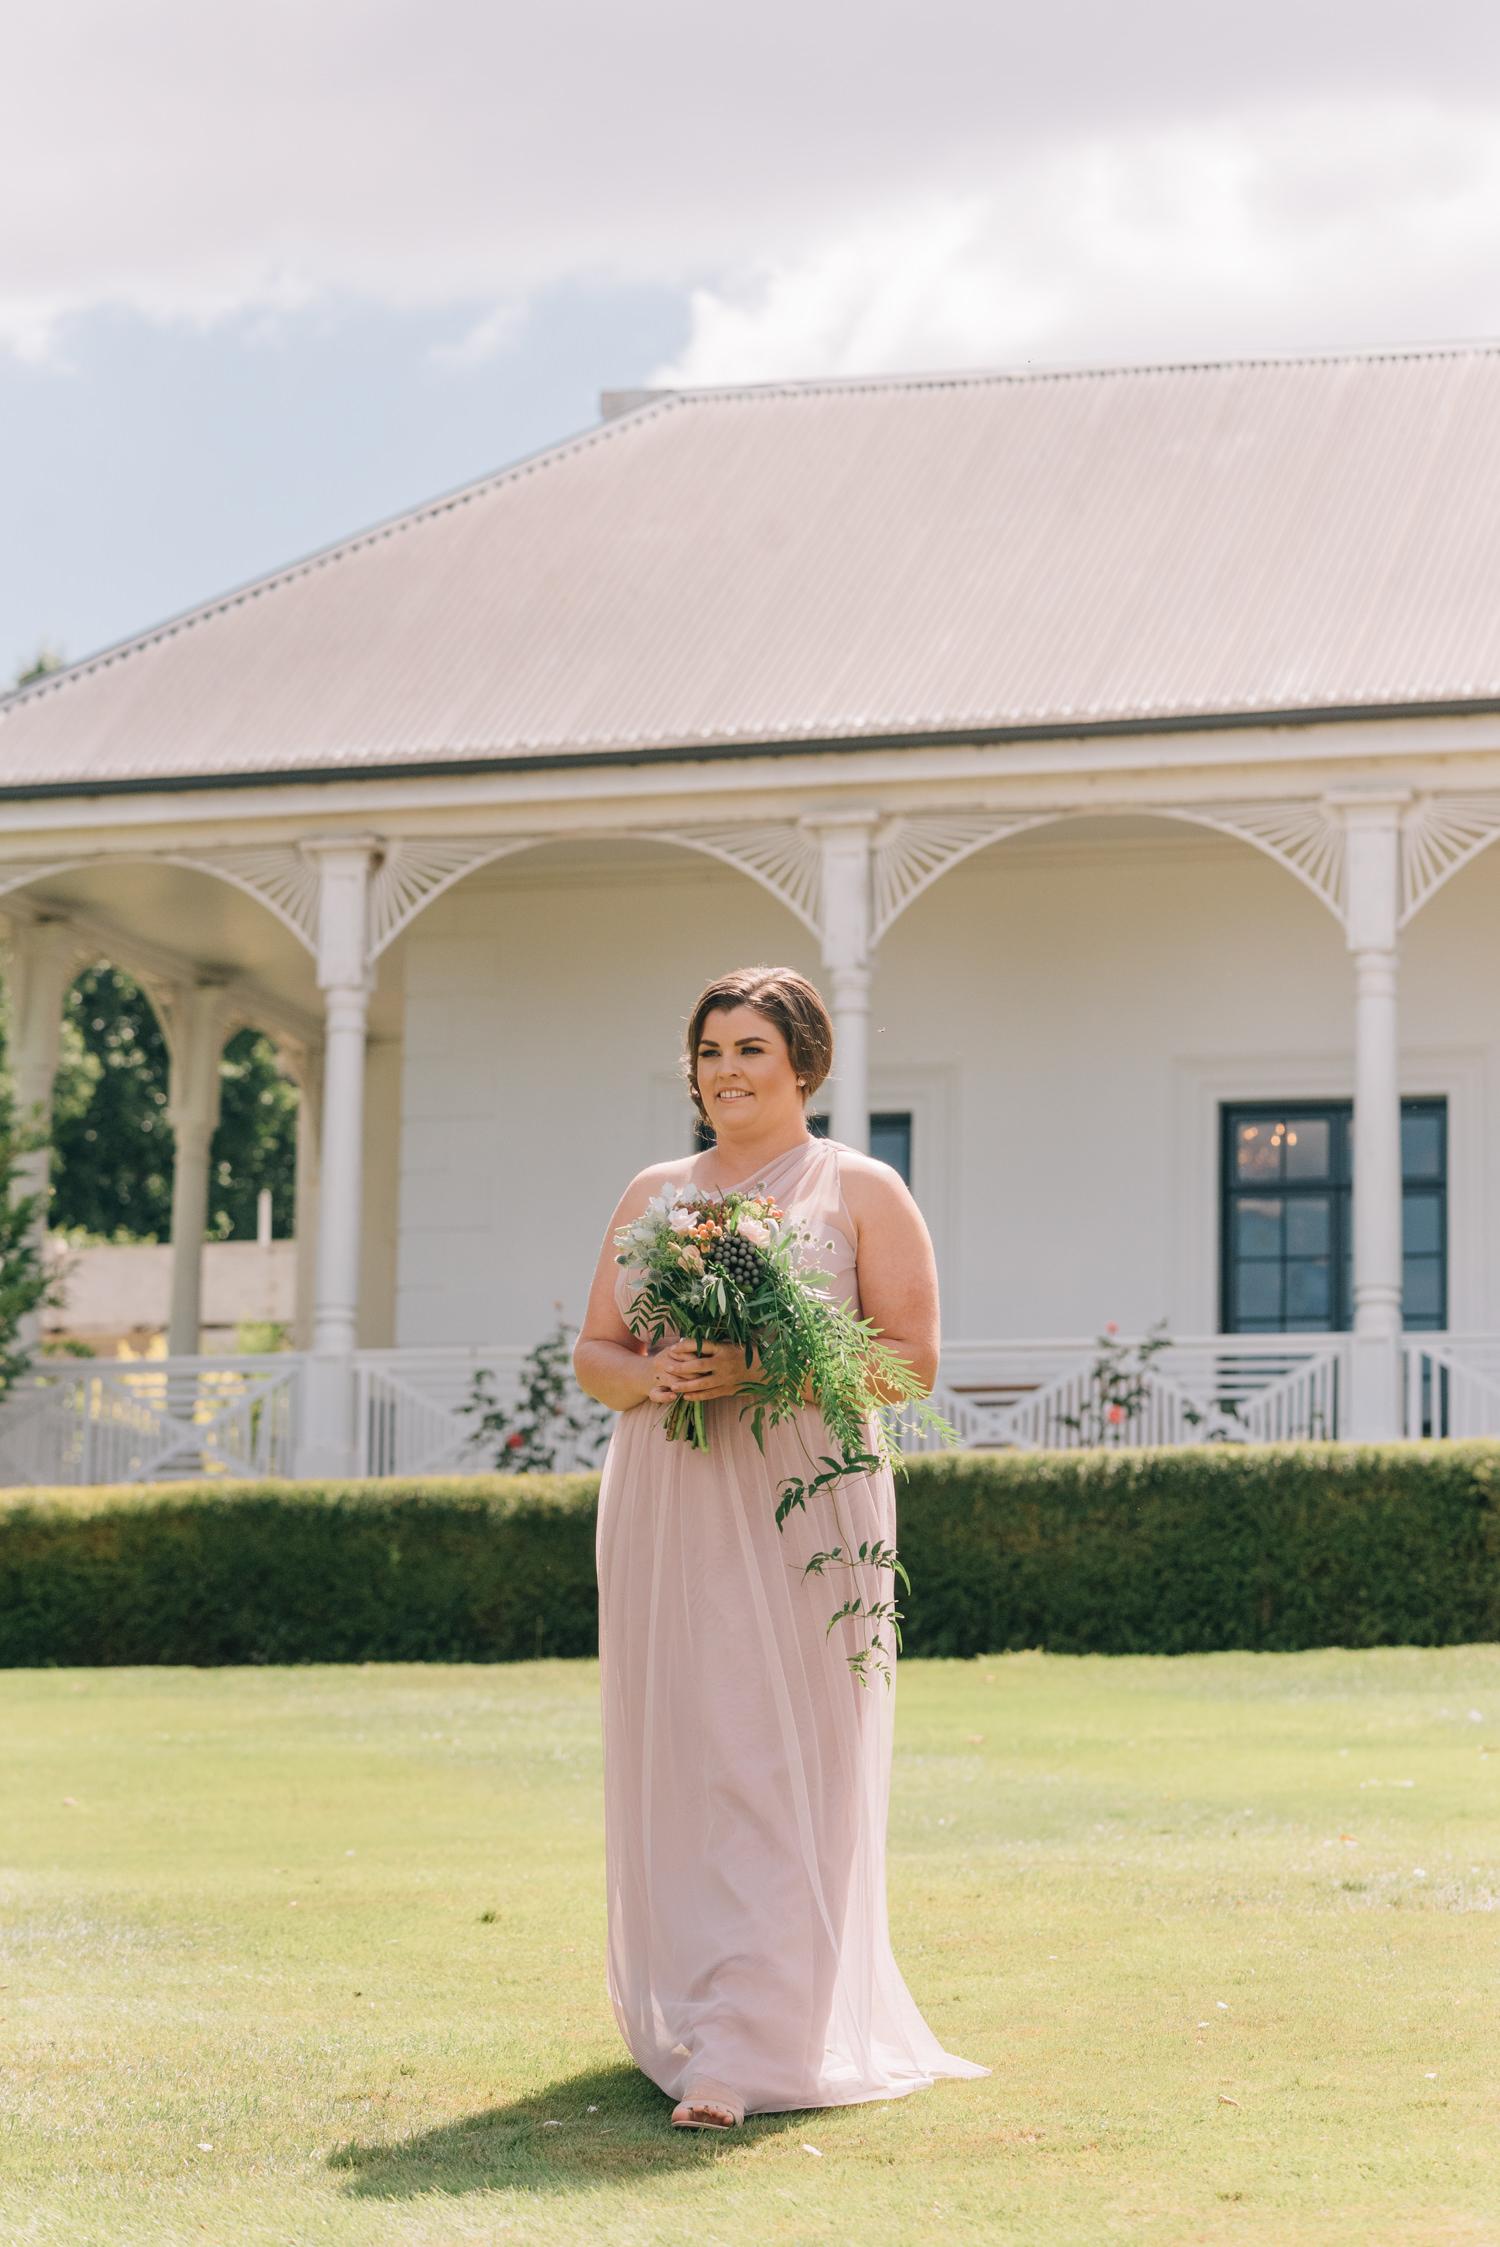 Quamby-Wedding-Photographer-61.jpg